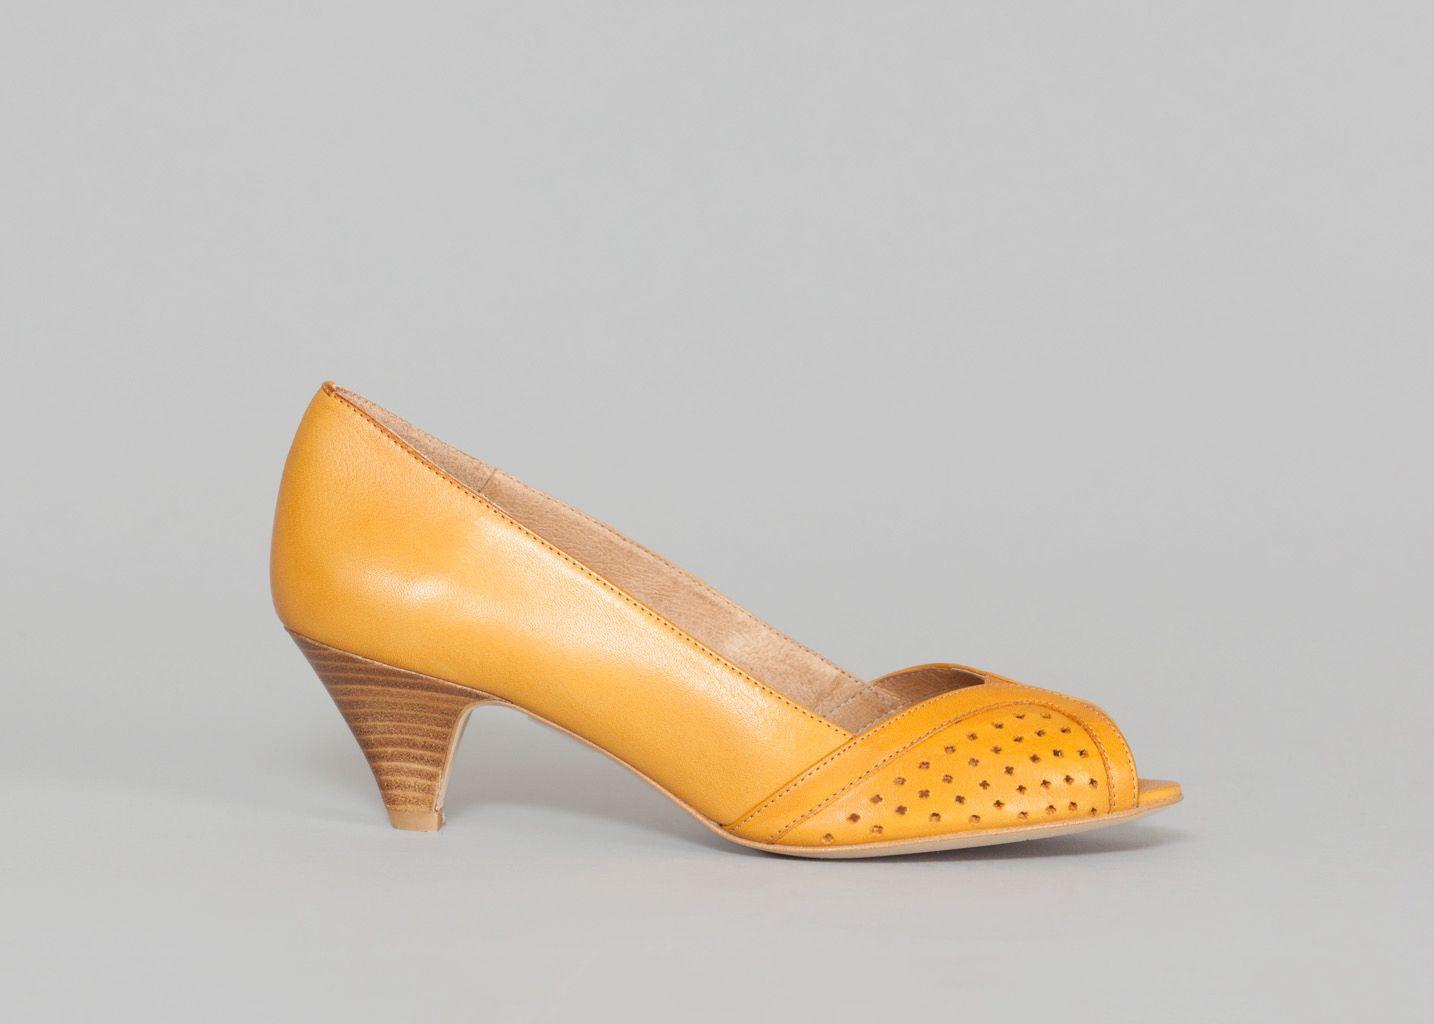 Totem sandales Chaussures Sess霉n Totem Sessun Papoose OwNZ8k0PnX